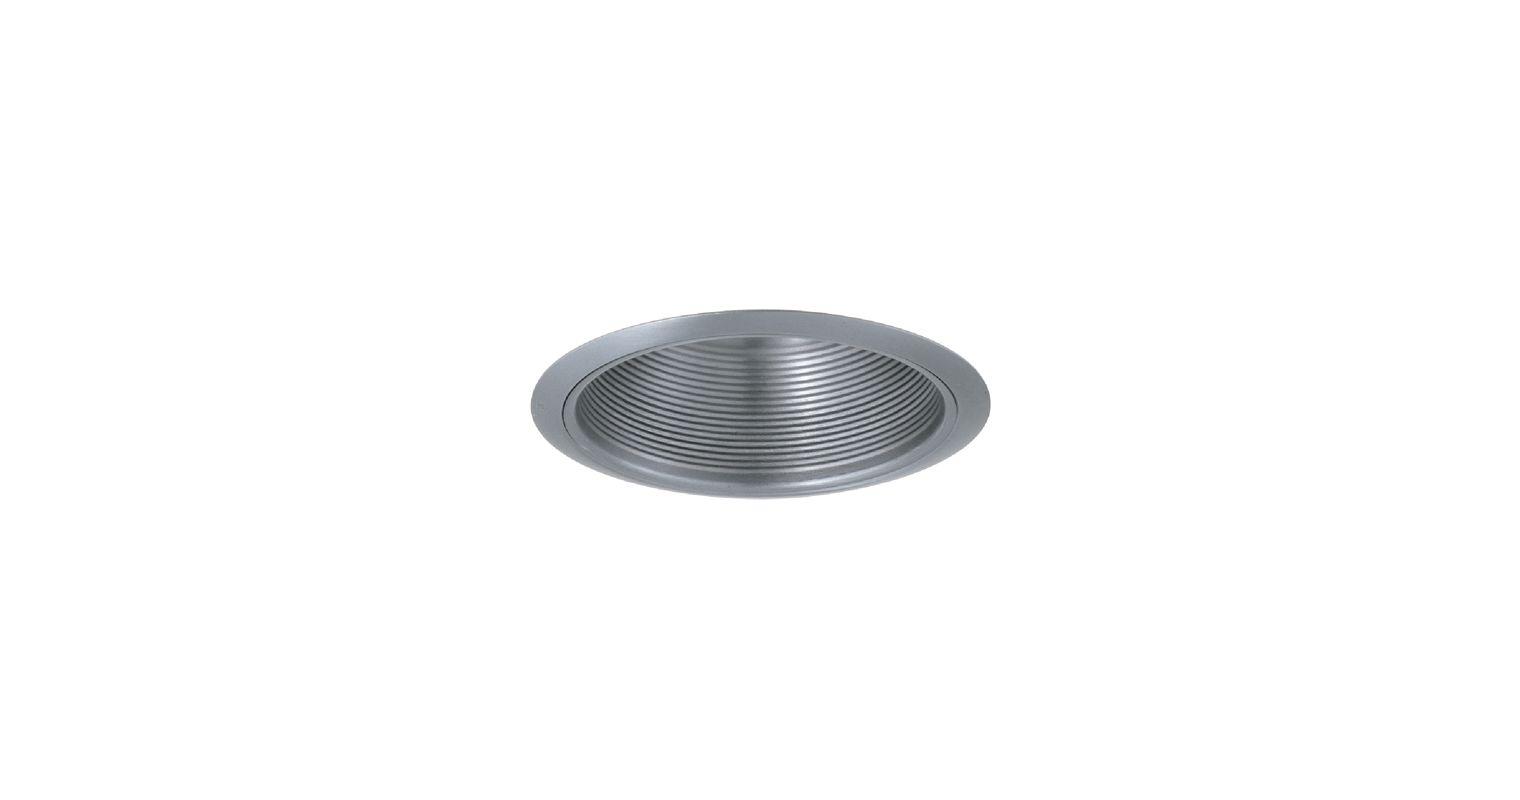 Recessed Lighting Elco : Elco elm n nickel quot recessed lighting trim metal